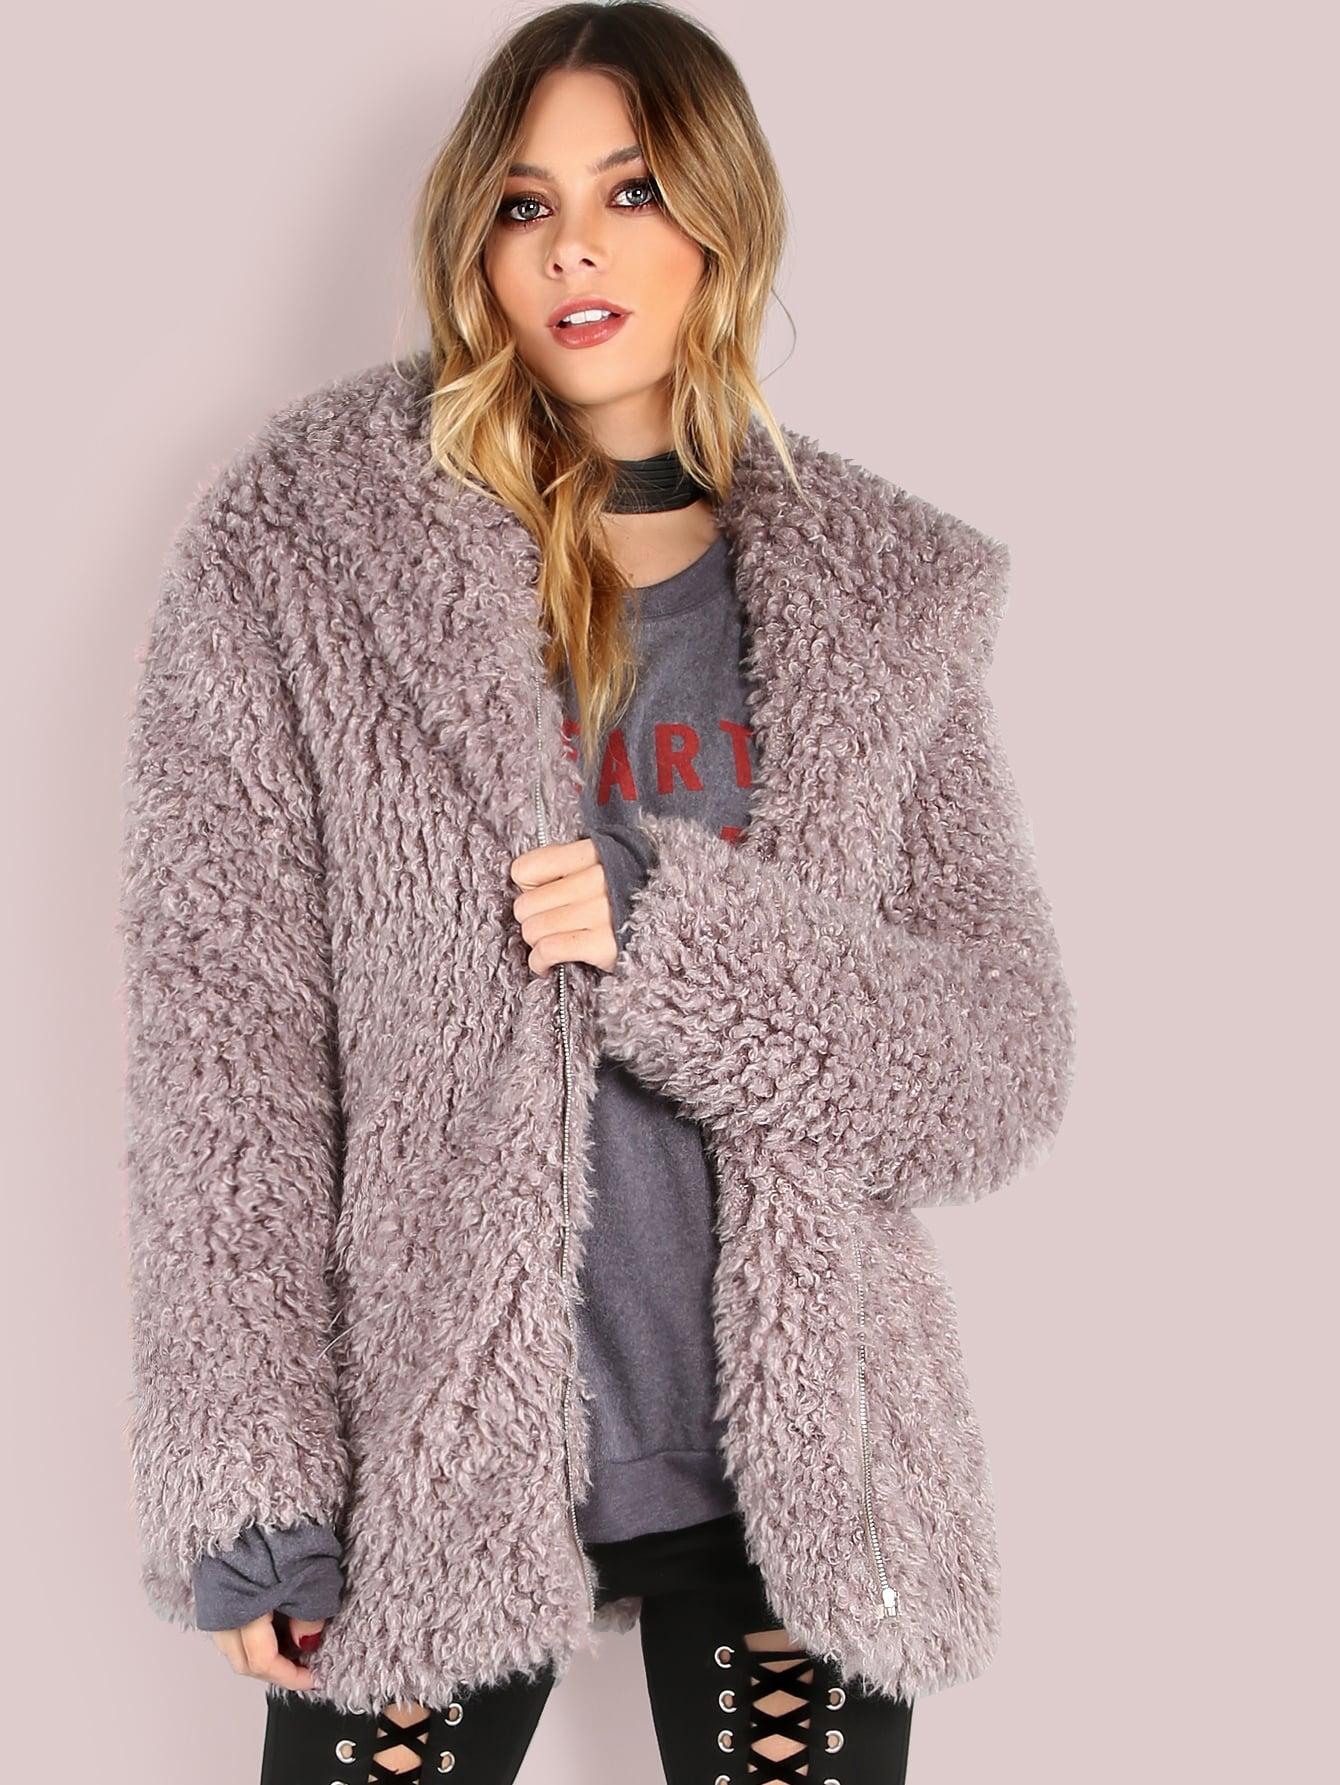 Grey Zip Up Faux Fur CoatGrey Zip Up Faux Fur Coat<br><br>color: Grey<br>size: L,M,S,XS